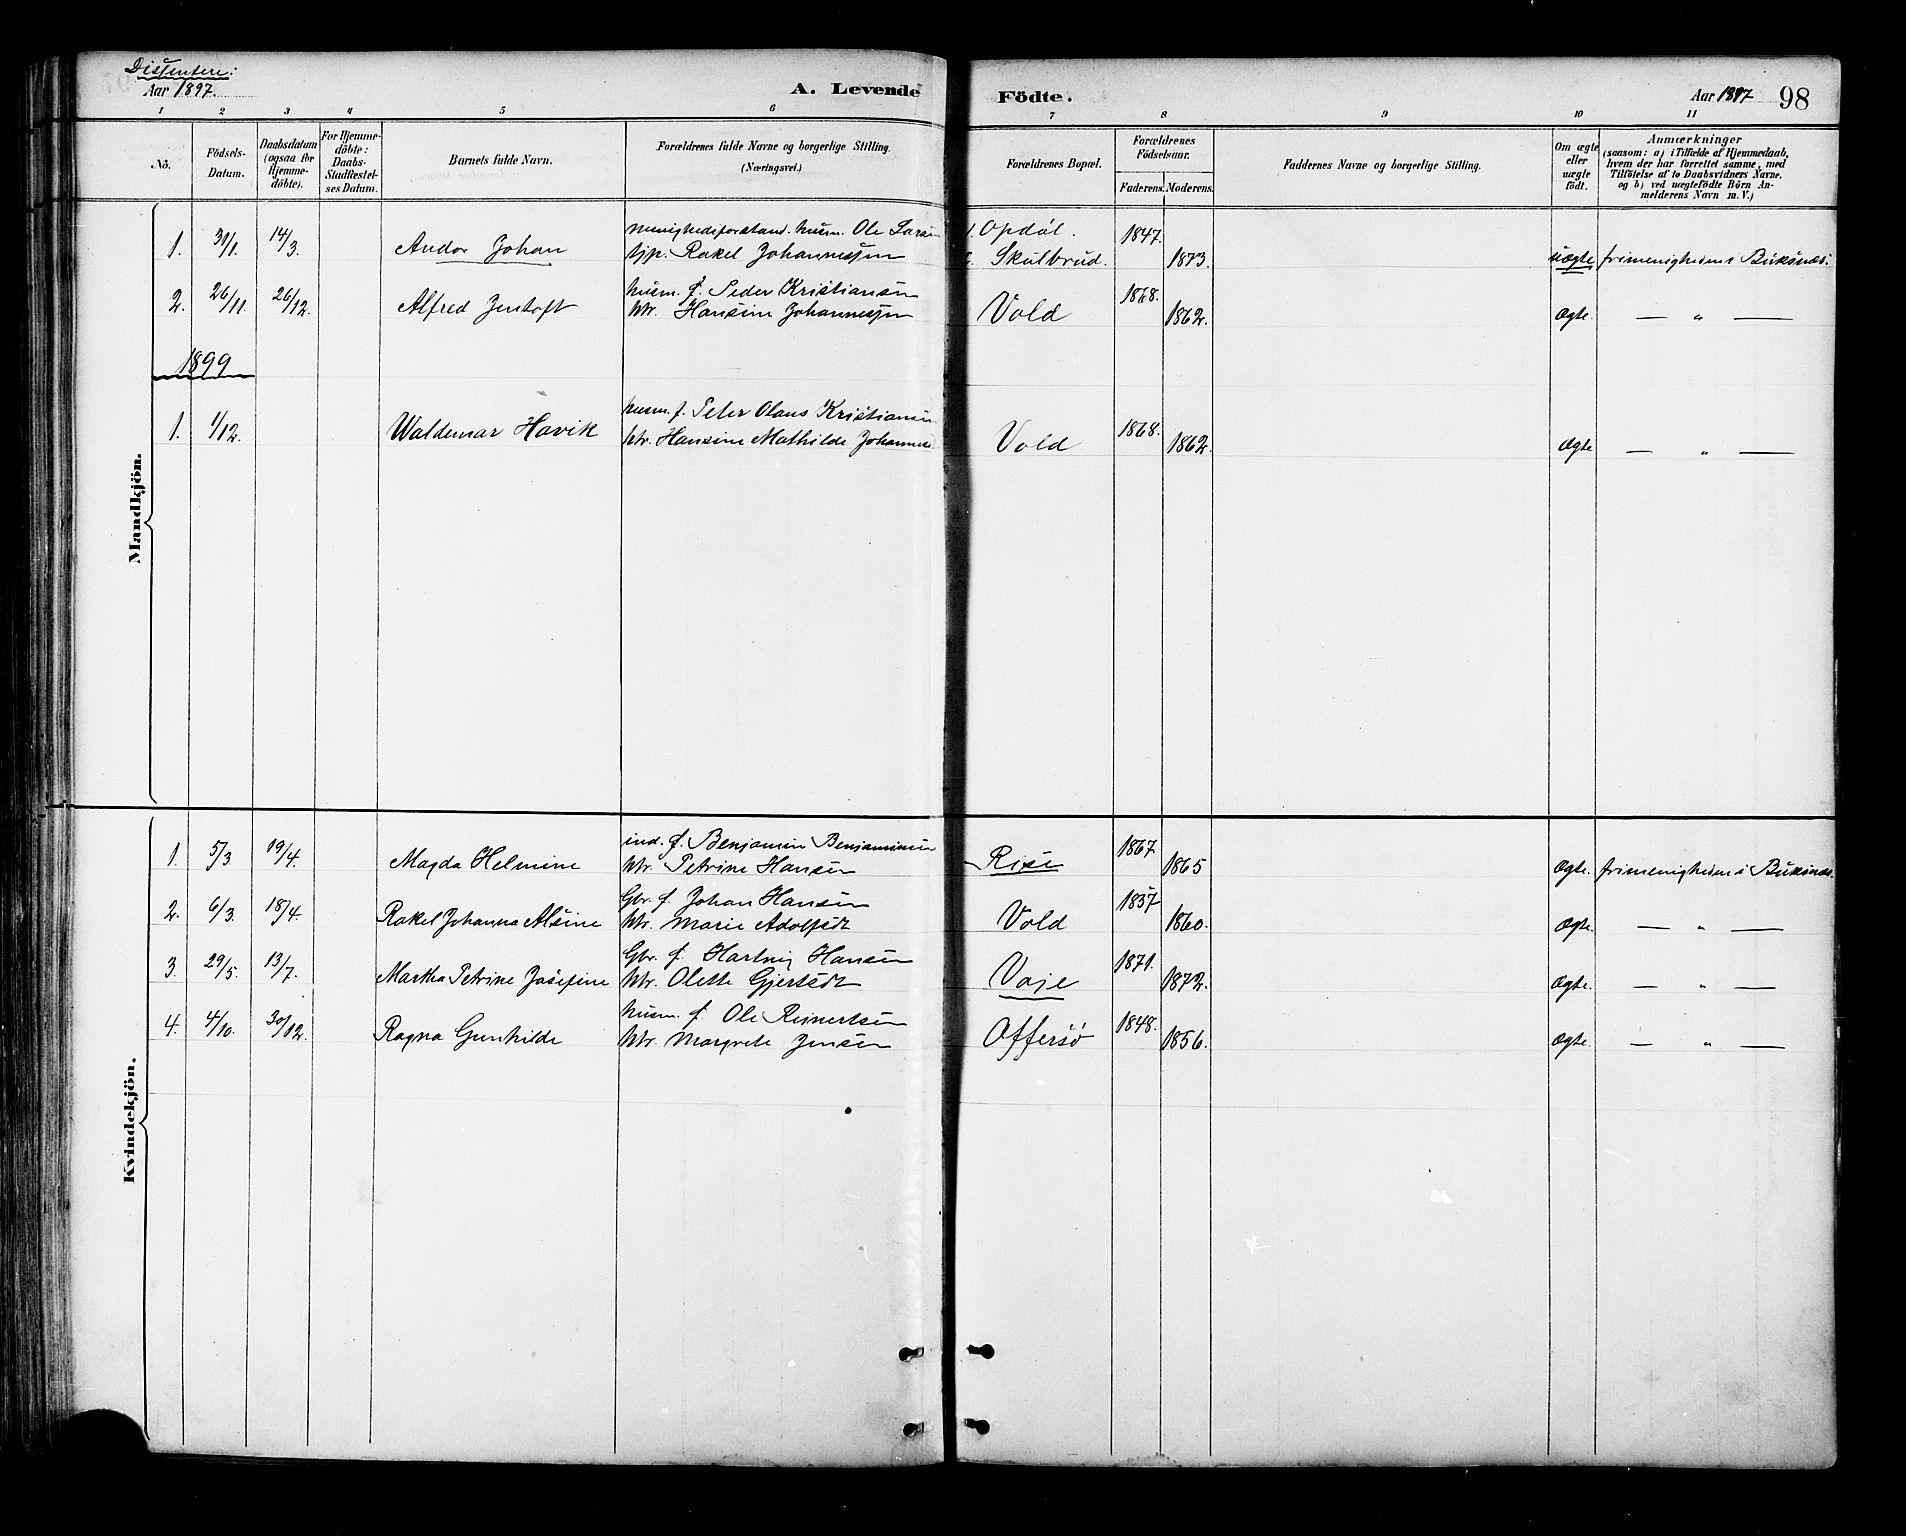 SAT, Ministerialprotokoller, klokkerbøker og fødselsregistre - Nordland, 881/L1167: Klokkerbok nr. 881C04, 1886-1899, s. 98